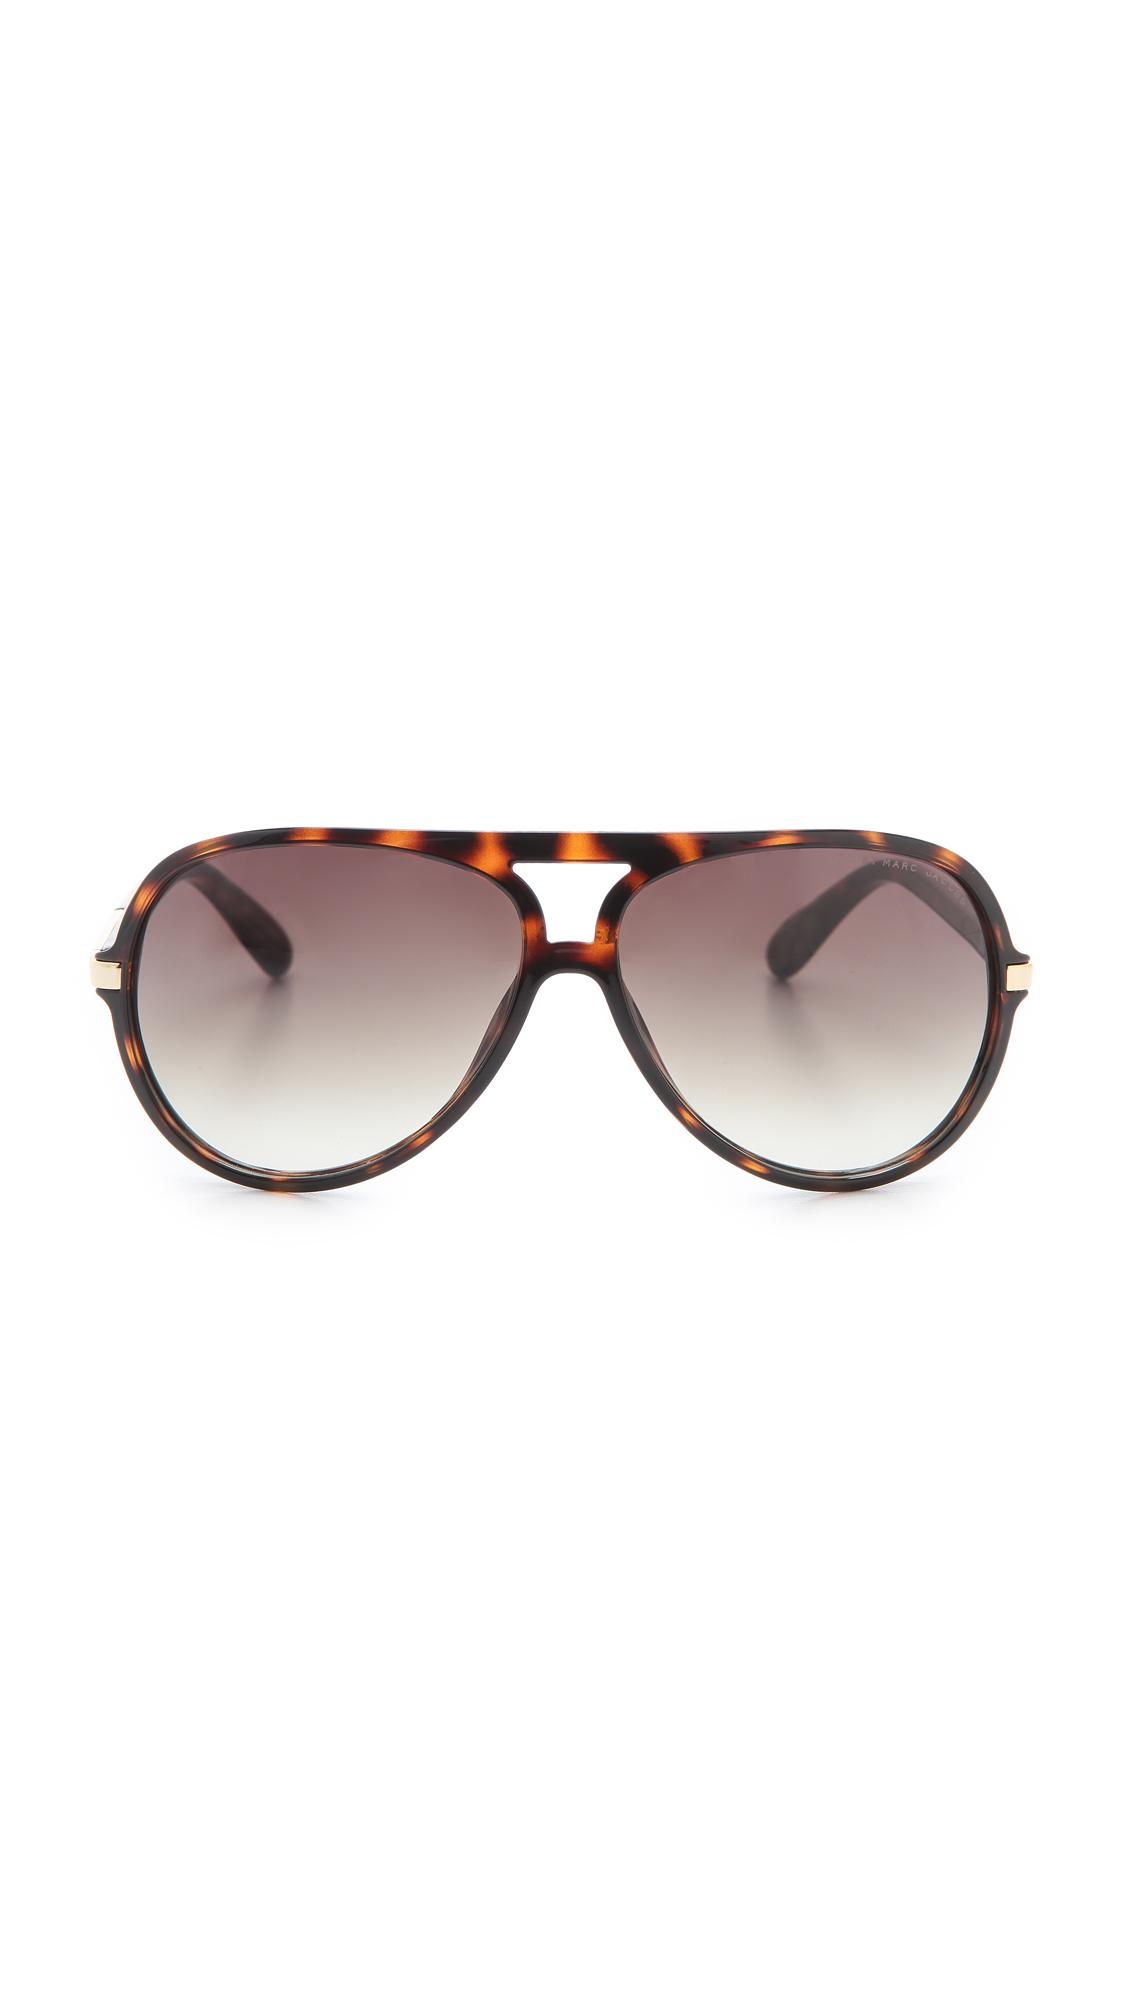 91e0d3e1baa Lyst - Marc By Marc Jacobs Oversized Aviator Sunglasses - Havana in ...